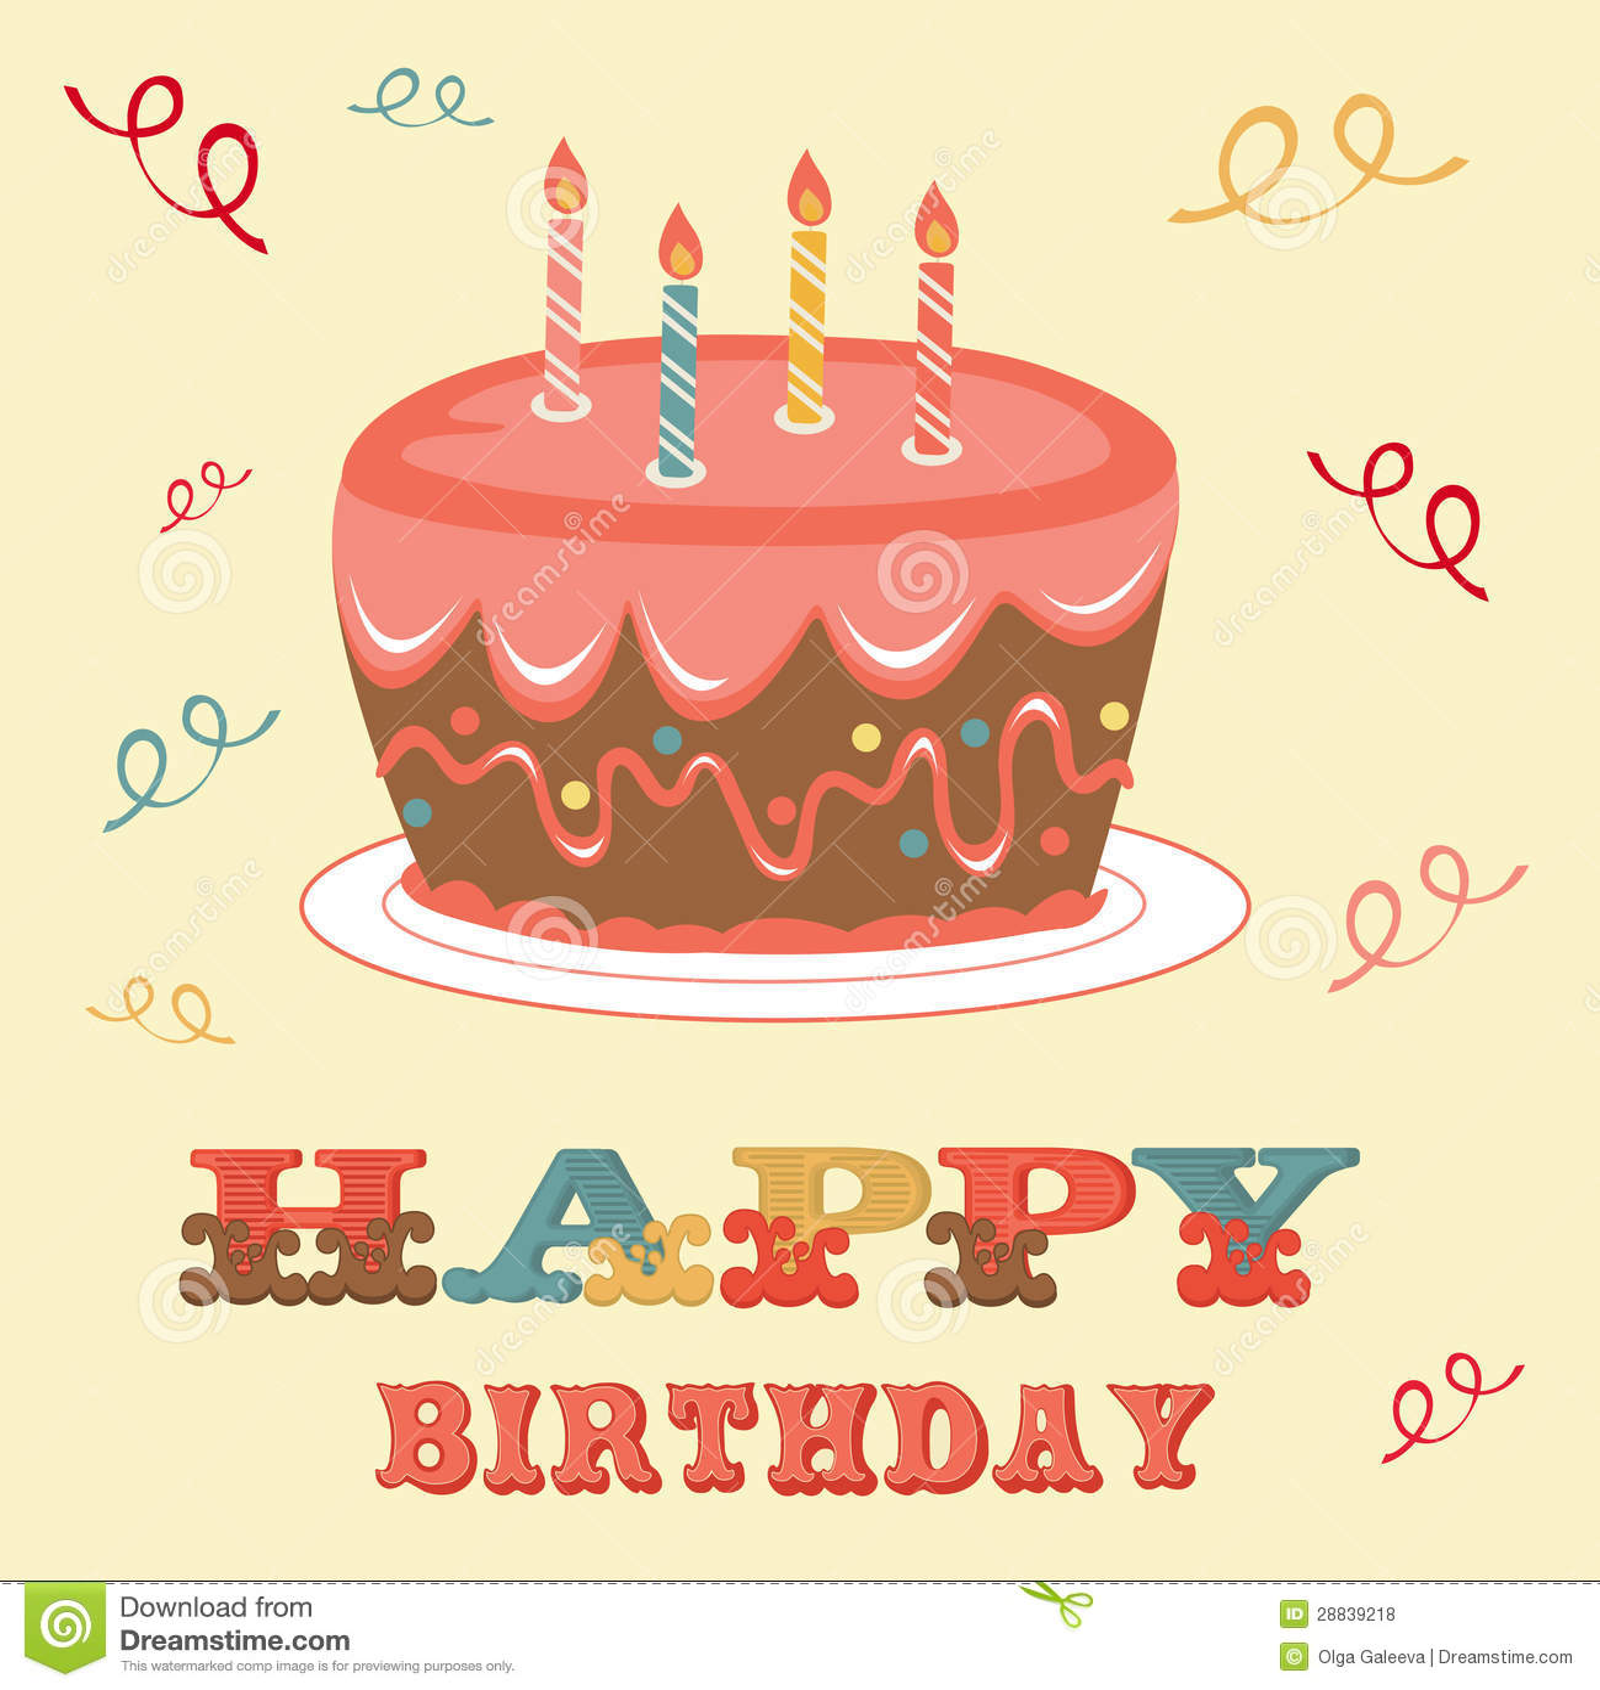 Birthday Card With Cake Royalty Free Stock Photos - Image ...